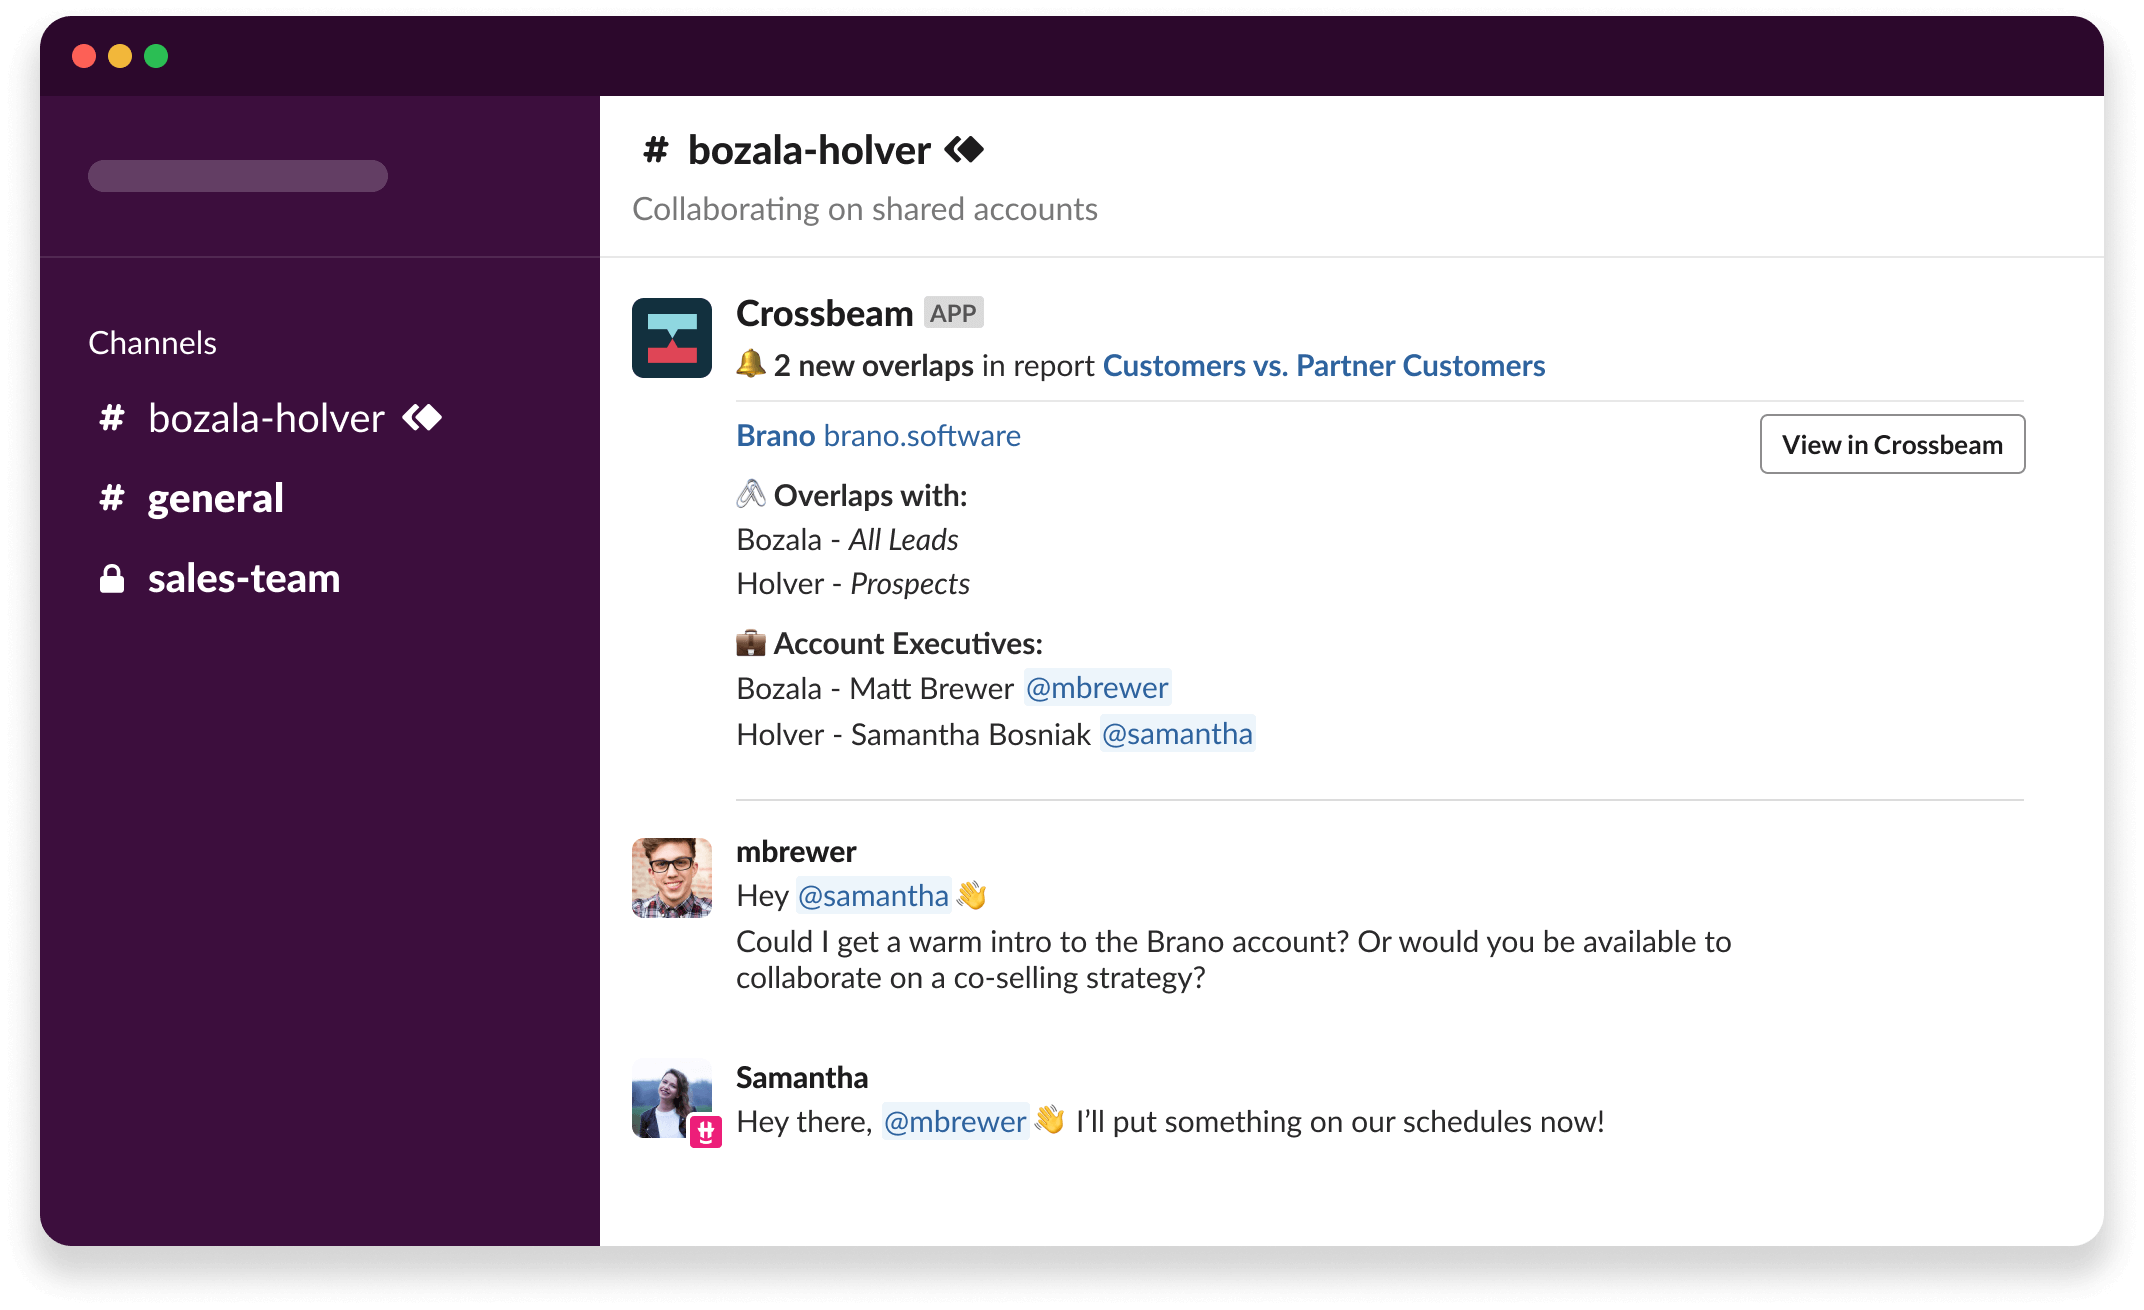 crossbeam-partner-overlaps-account-executive-mentions